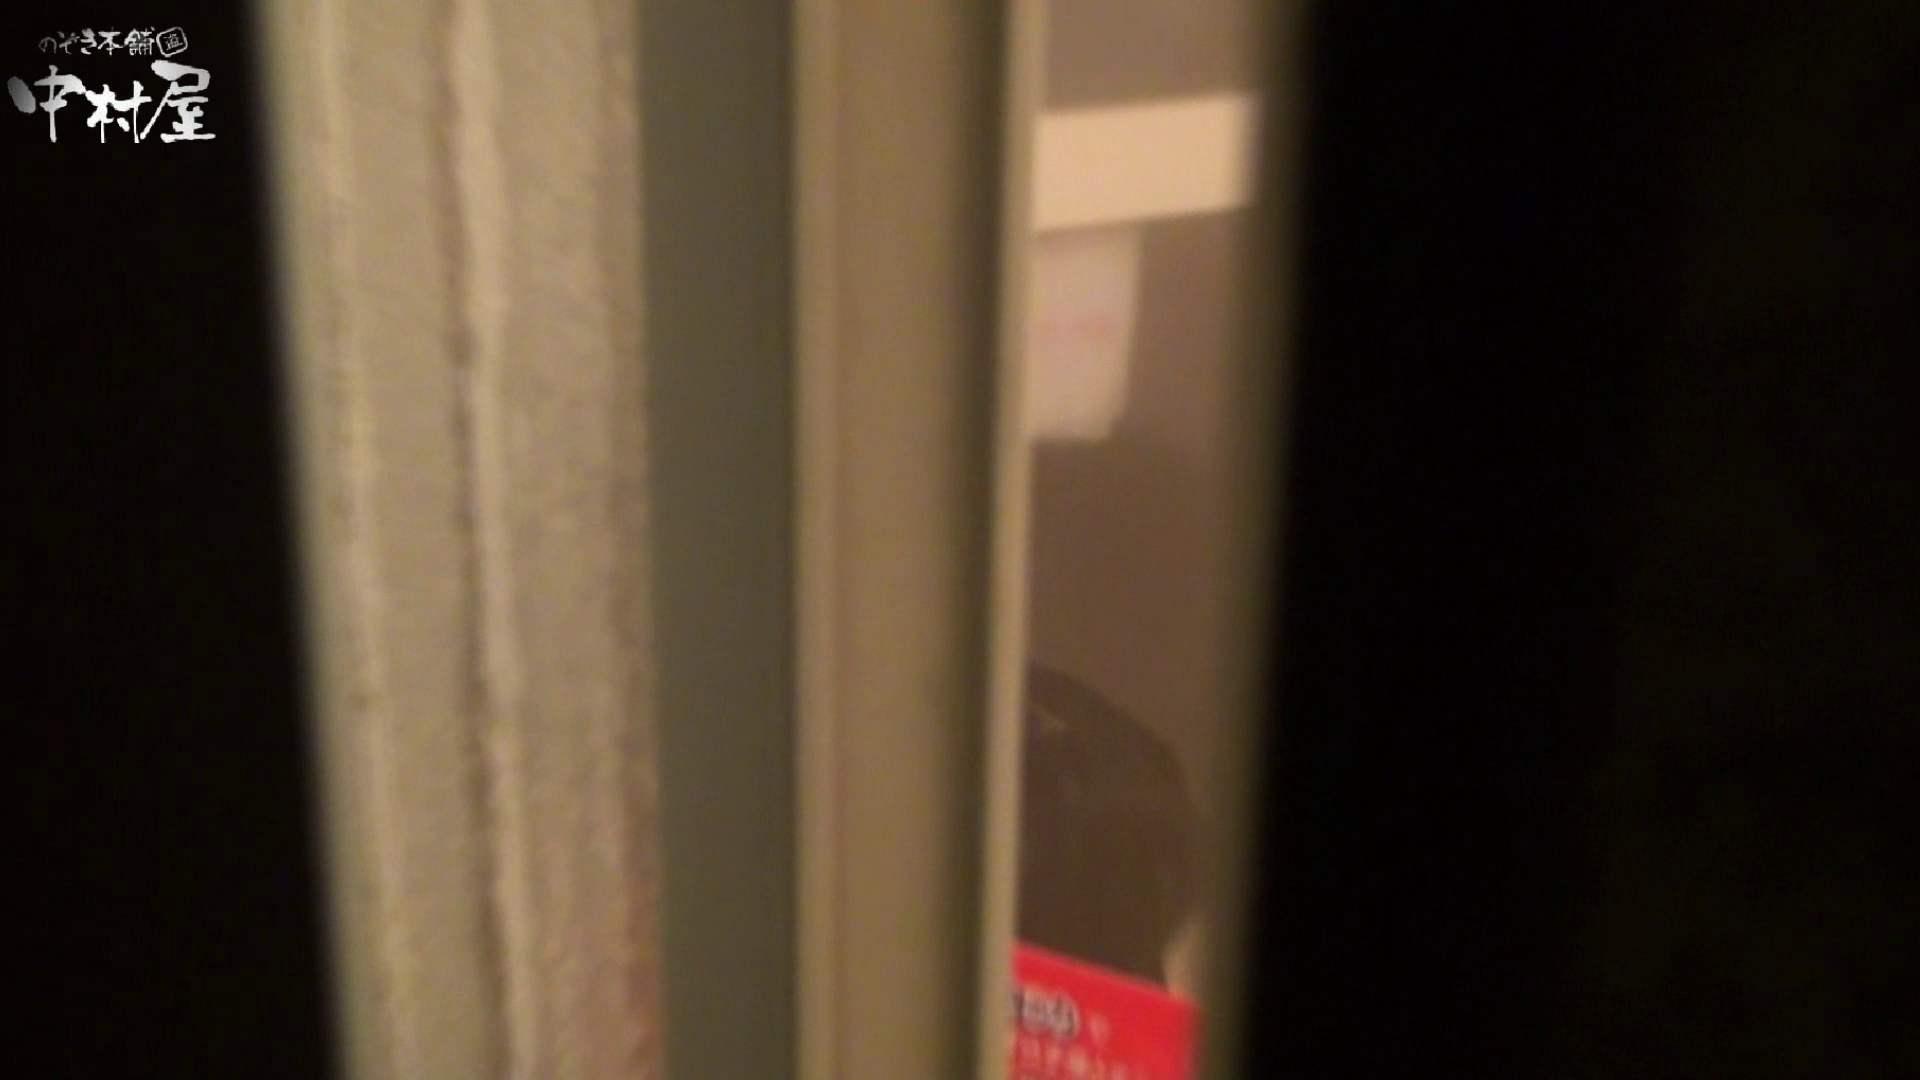 民家風呂専門盗撮師の超危険映像 vol.032 盗撮シリーズ オメコ無修正動画無料 102PIX 47